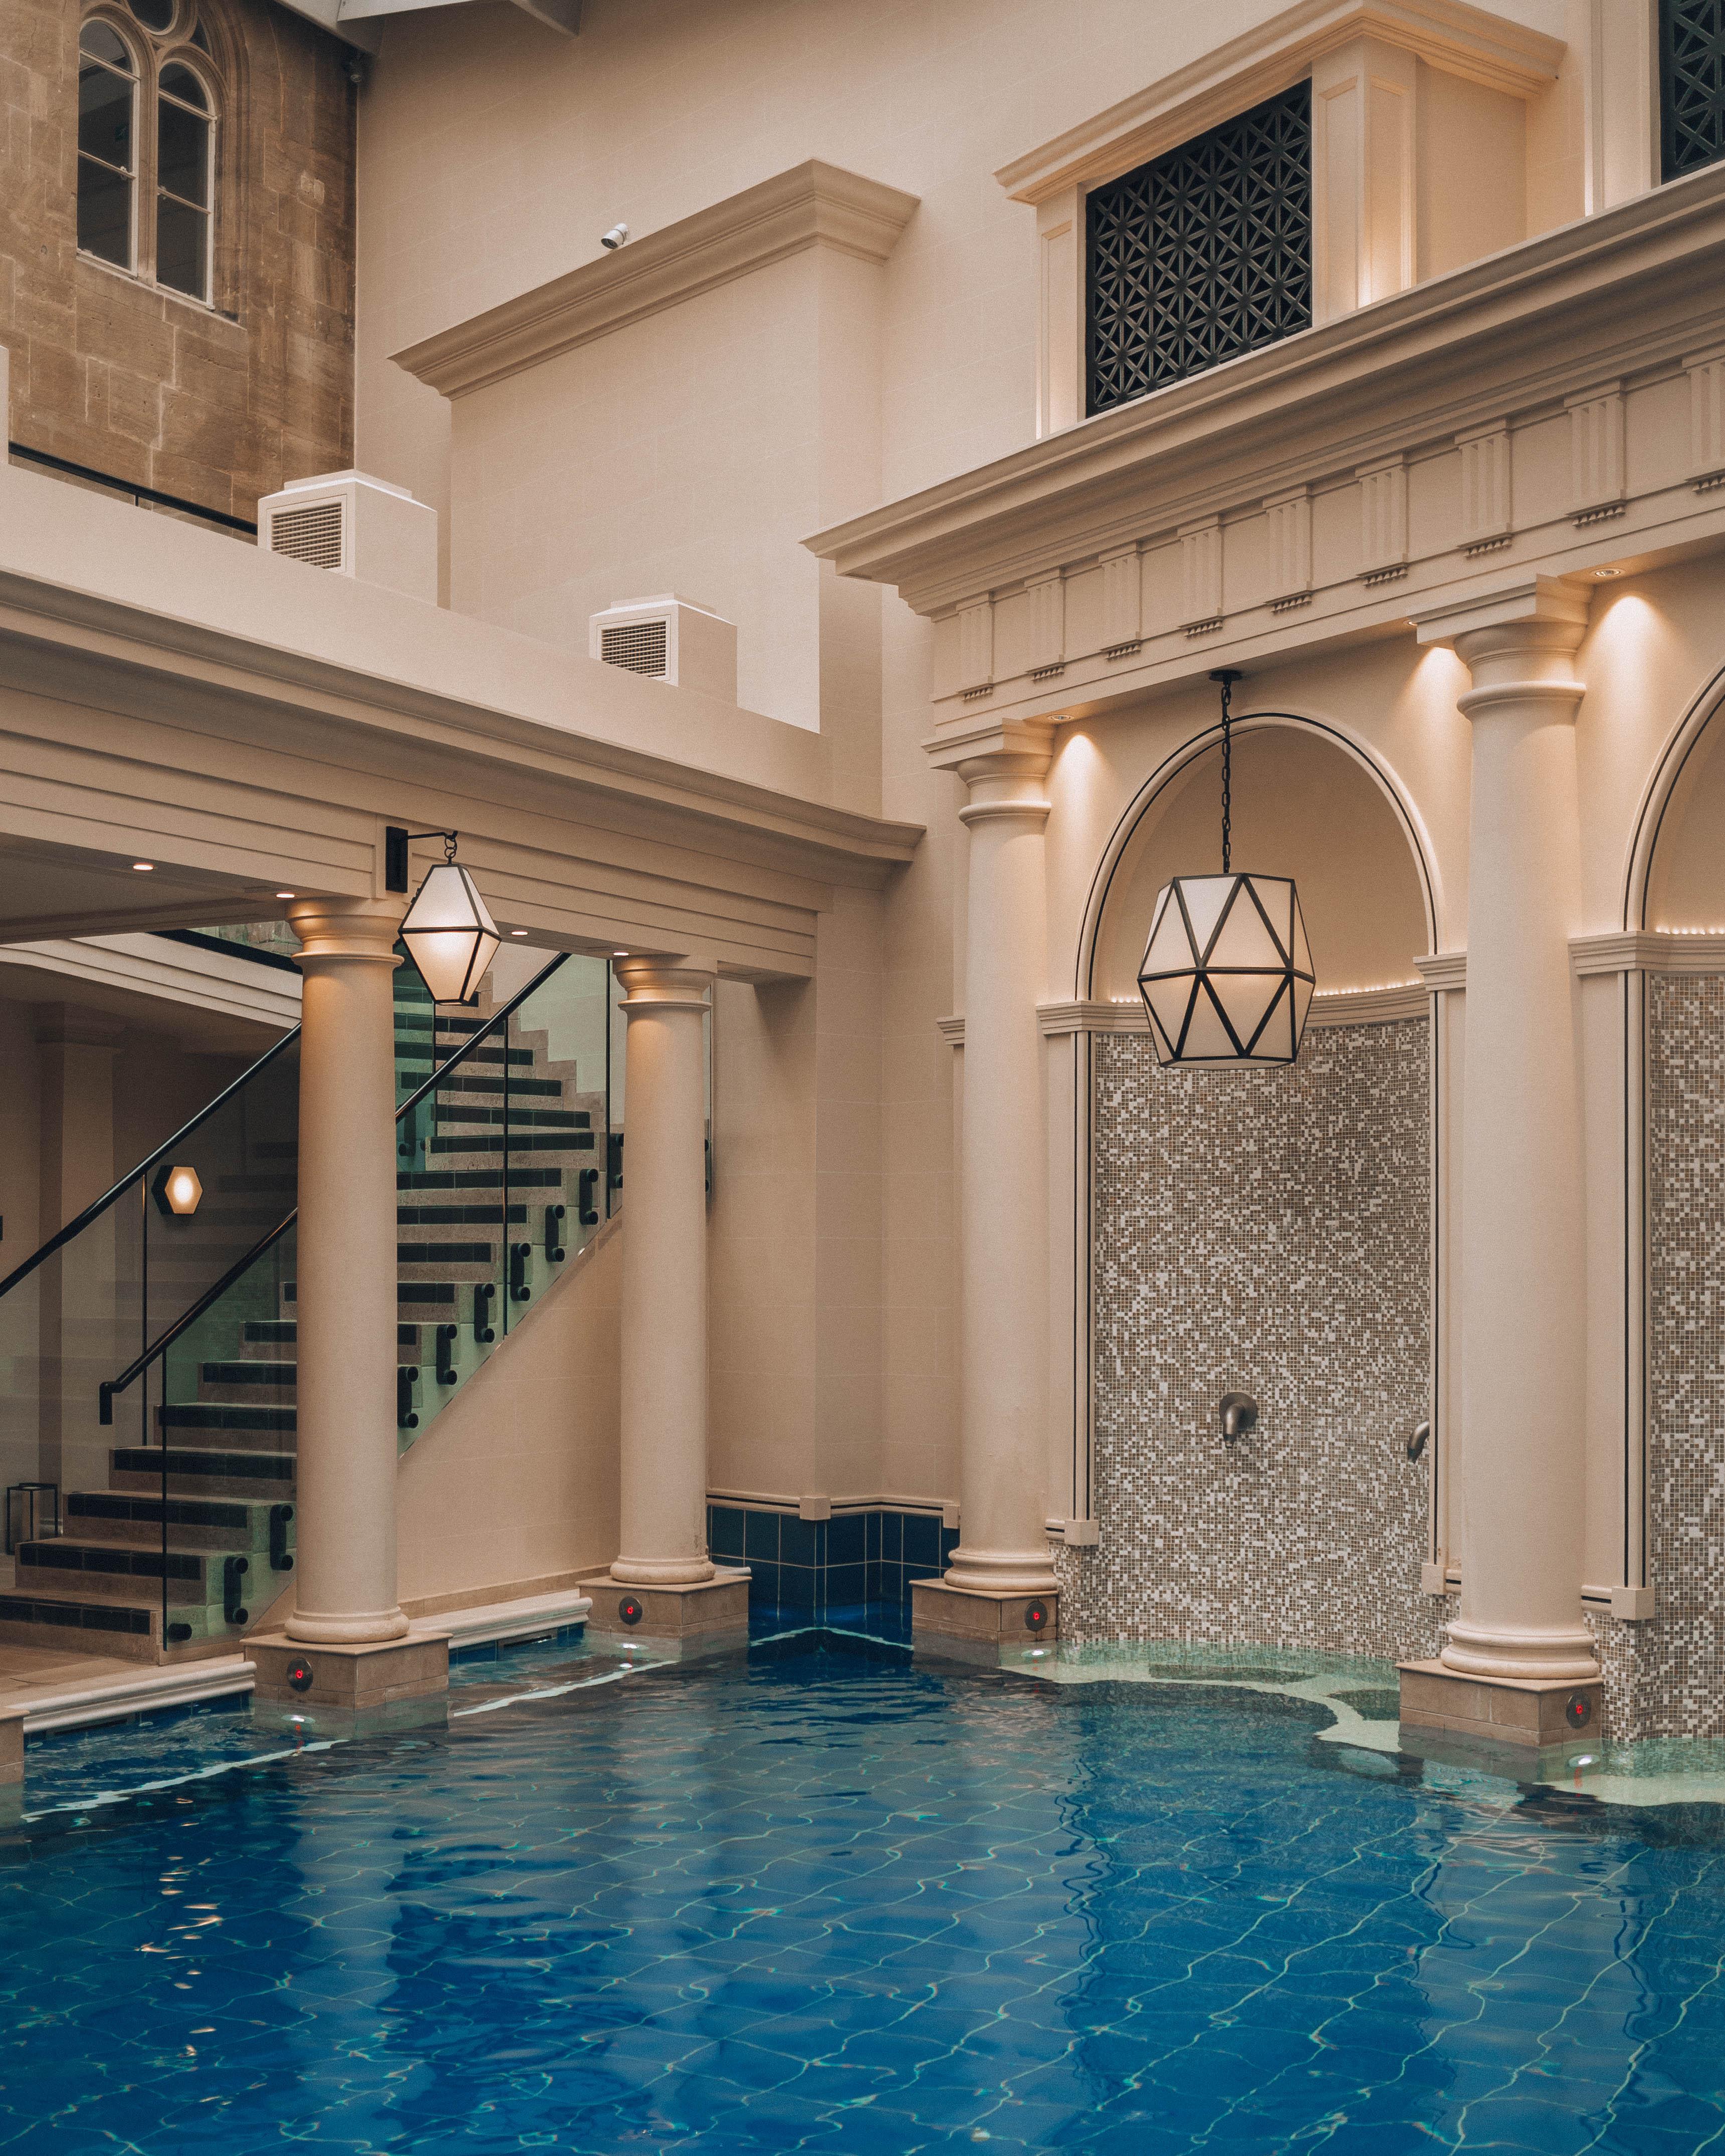 Staycation in Bath